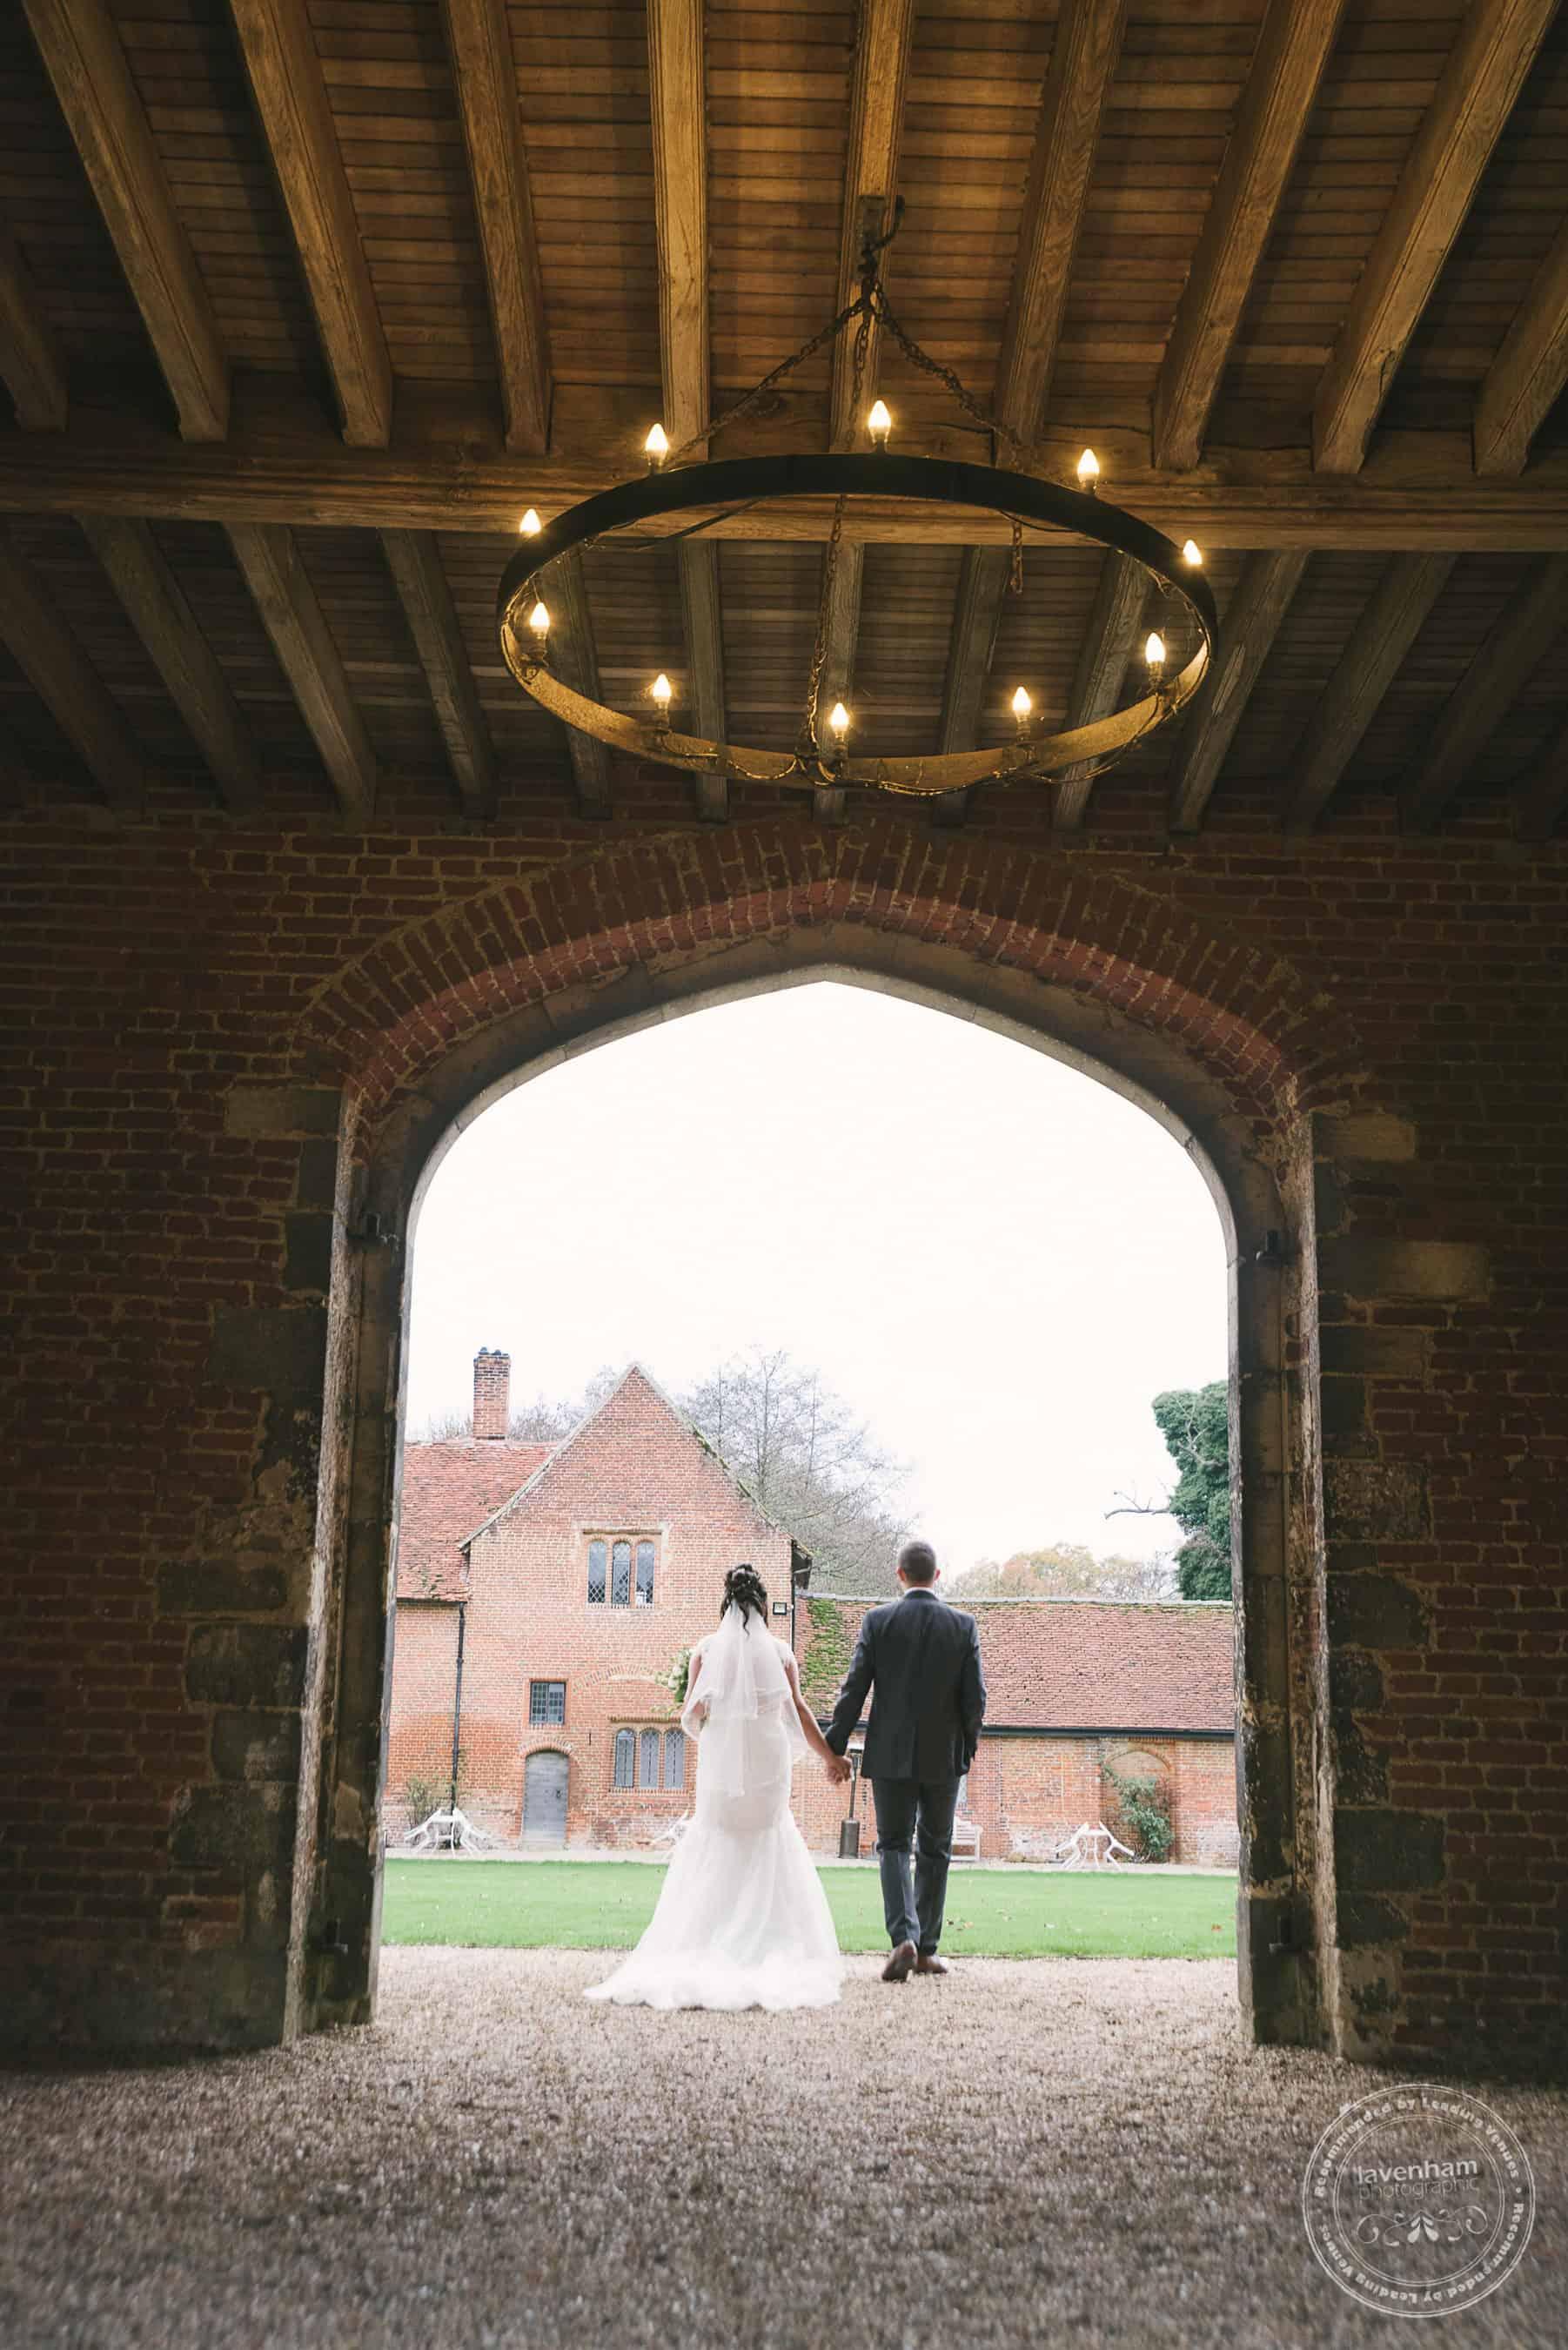 251118 Leez Priory Wedding Photography by Lavenham Photographic 089